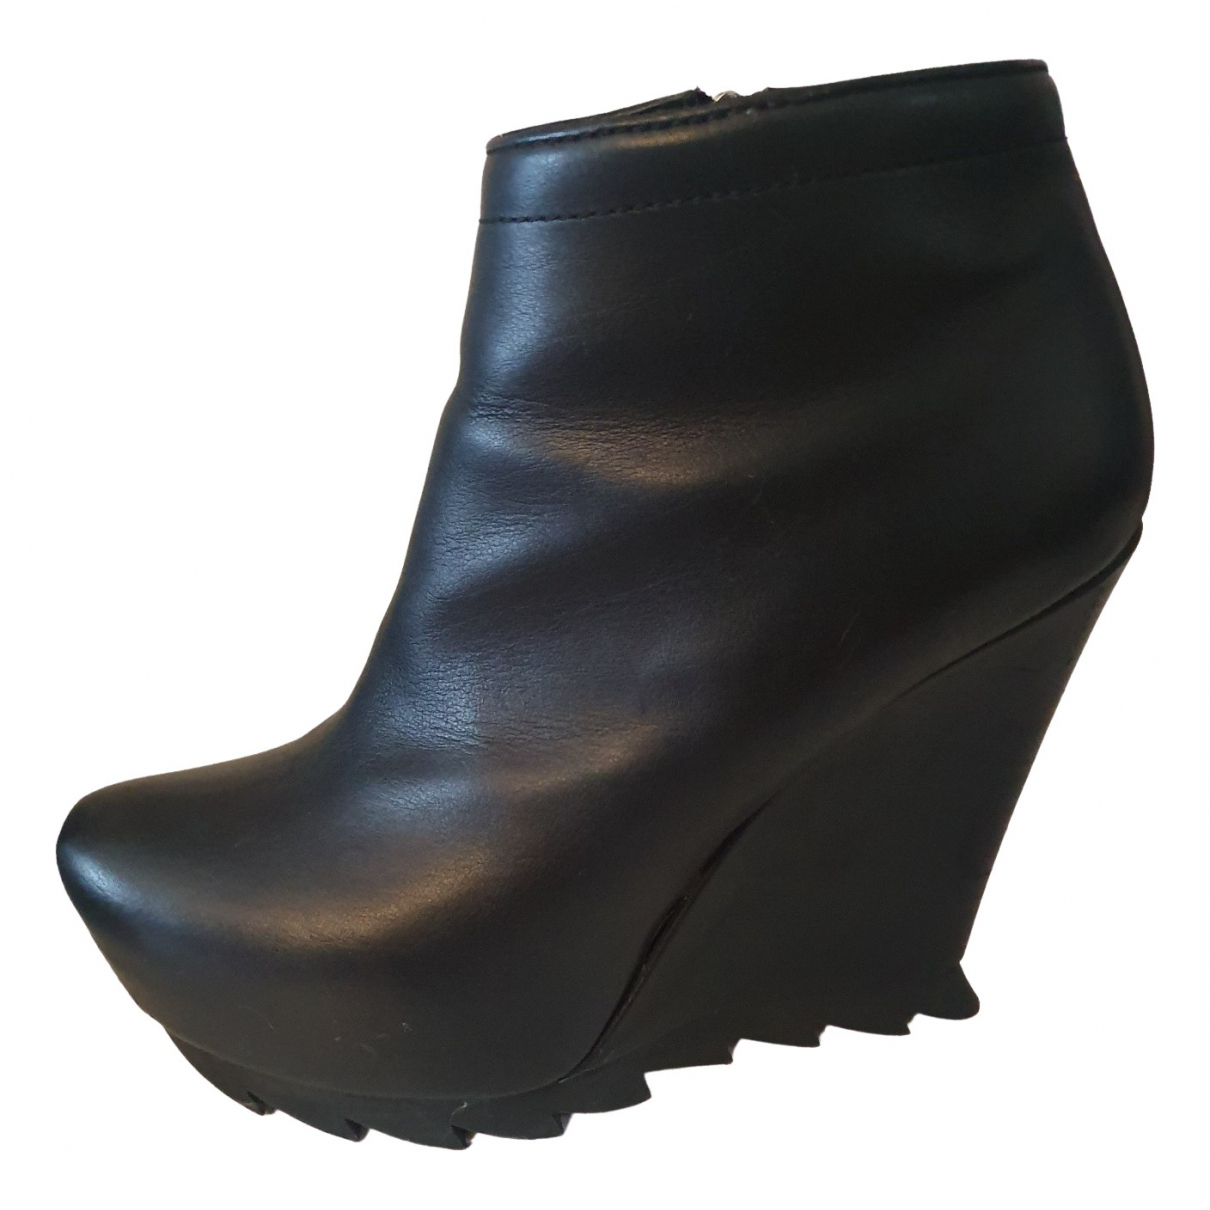 Camilla Skovgaard \N Black Leather Boots for Women 38 EU